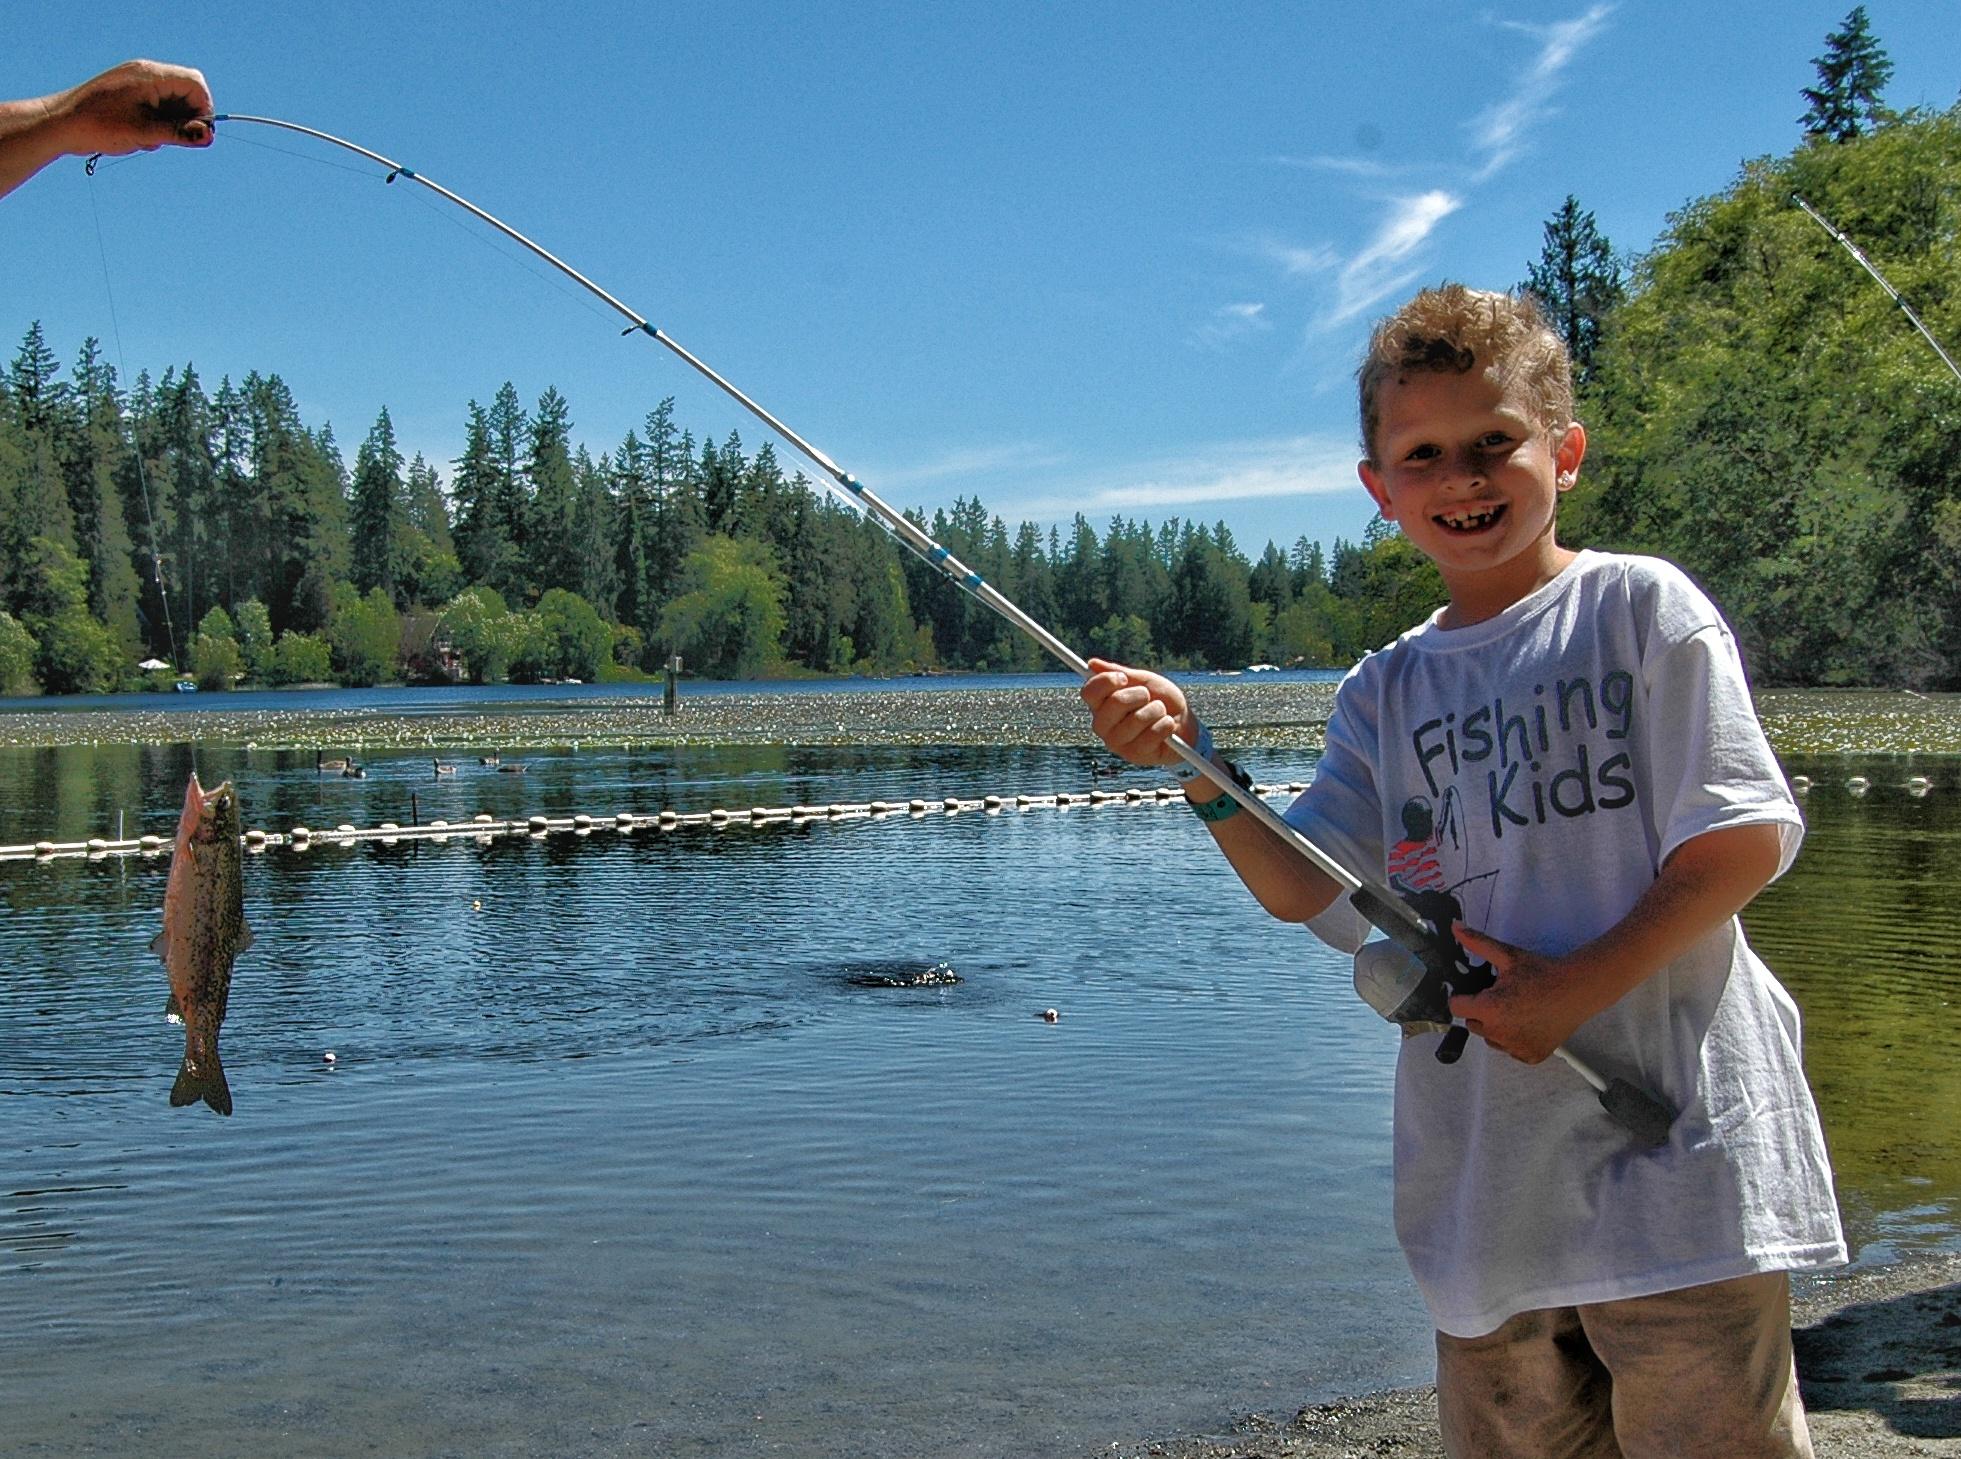 Fishing Kids – Island Lake (WA)